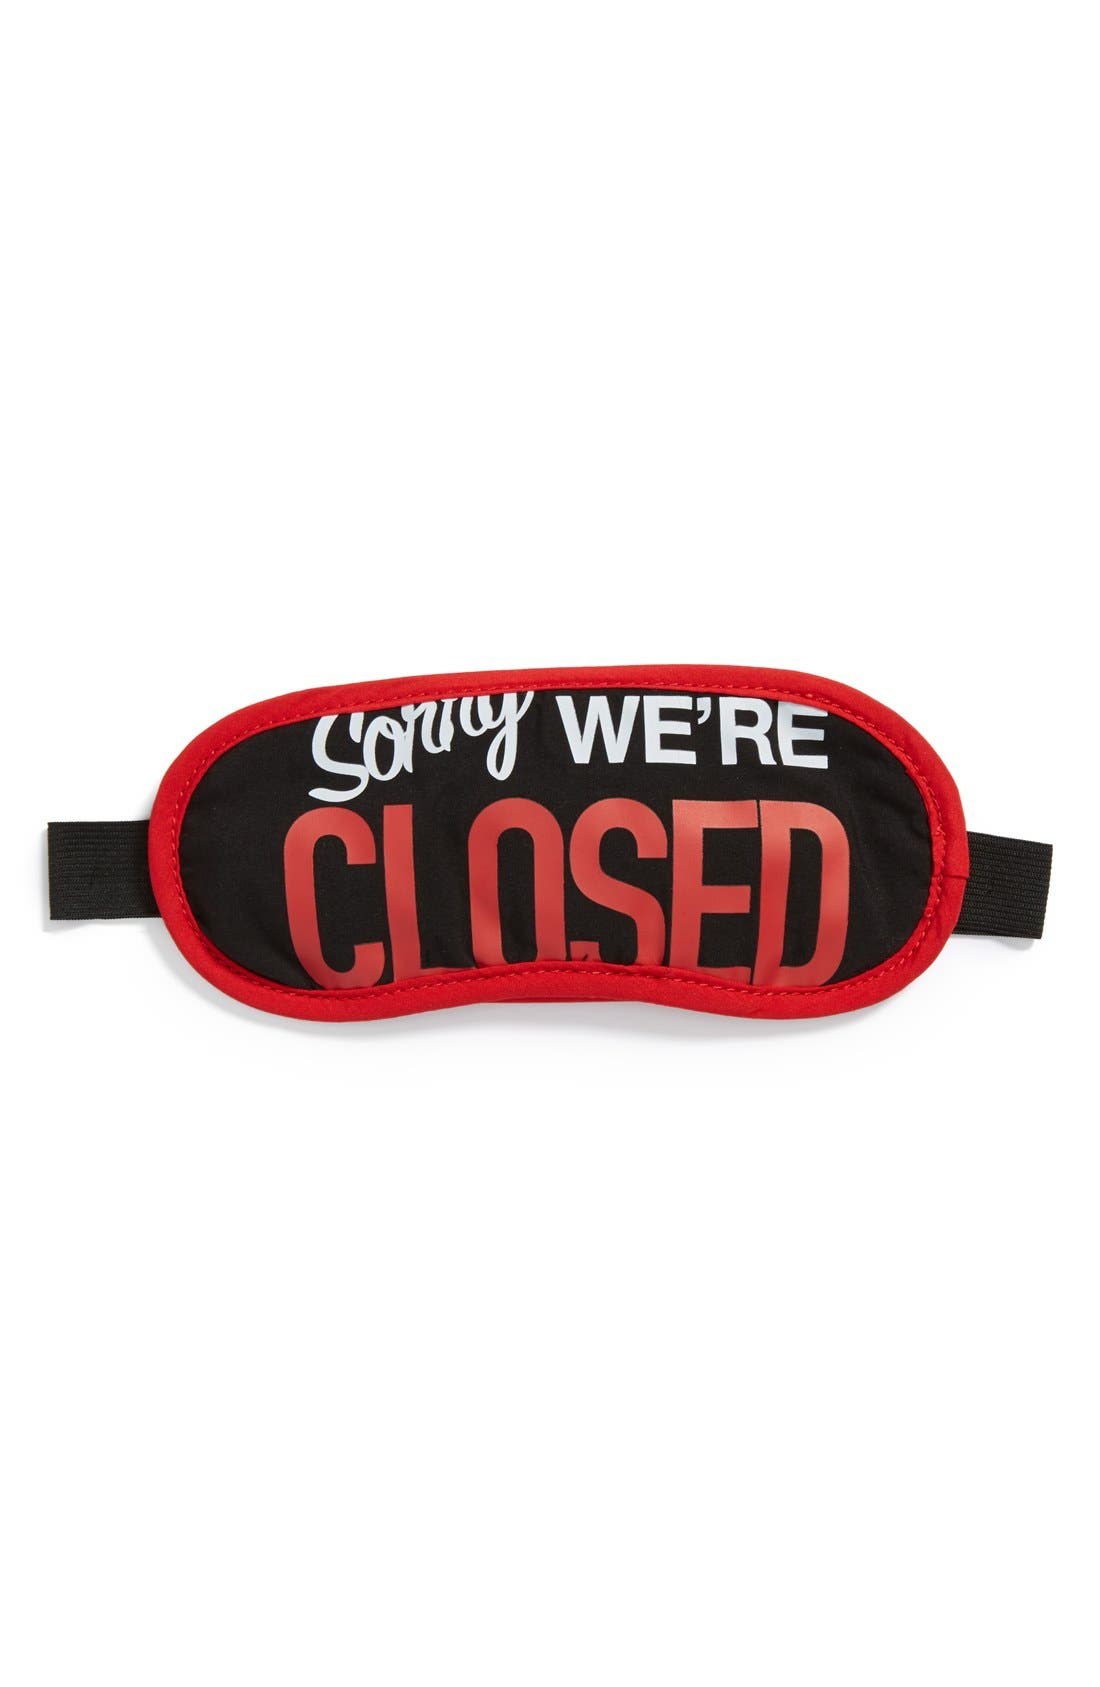 'Sorry, We're Closed' Sleep Mask,                             Main thumbnail 1, color,                             Black